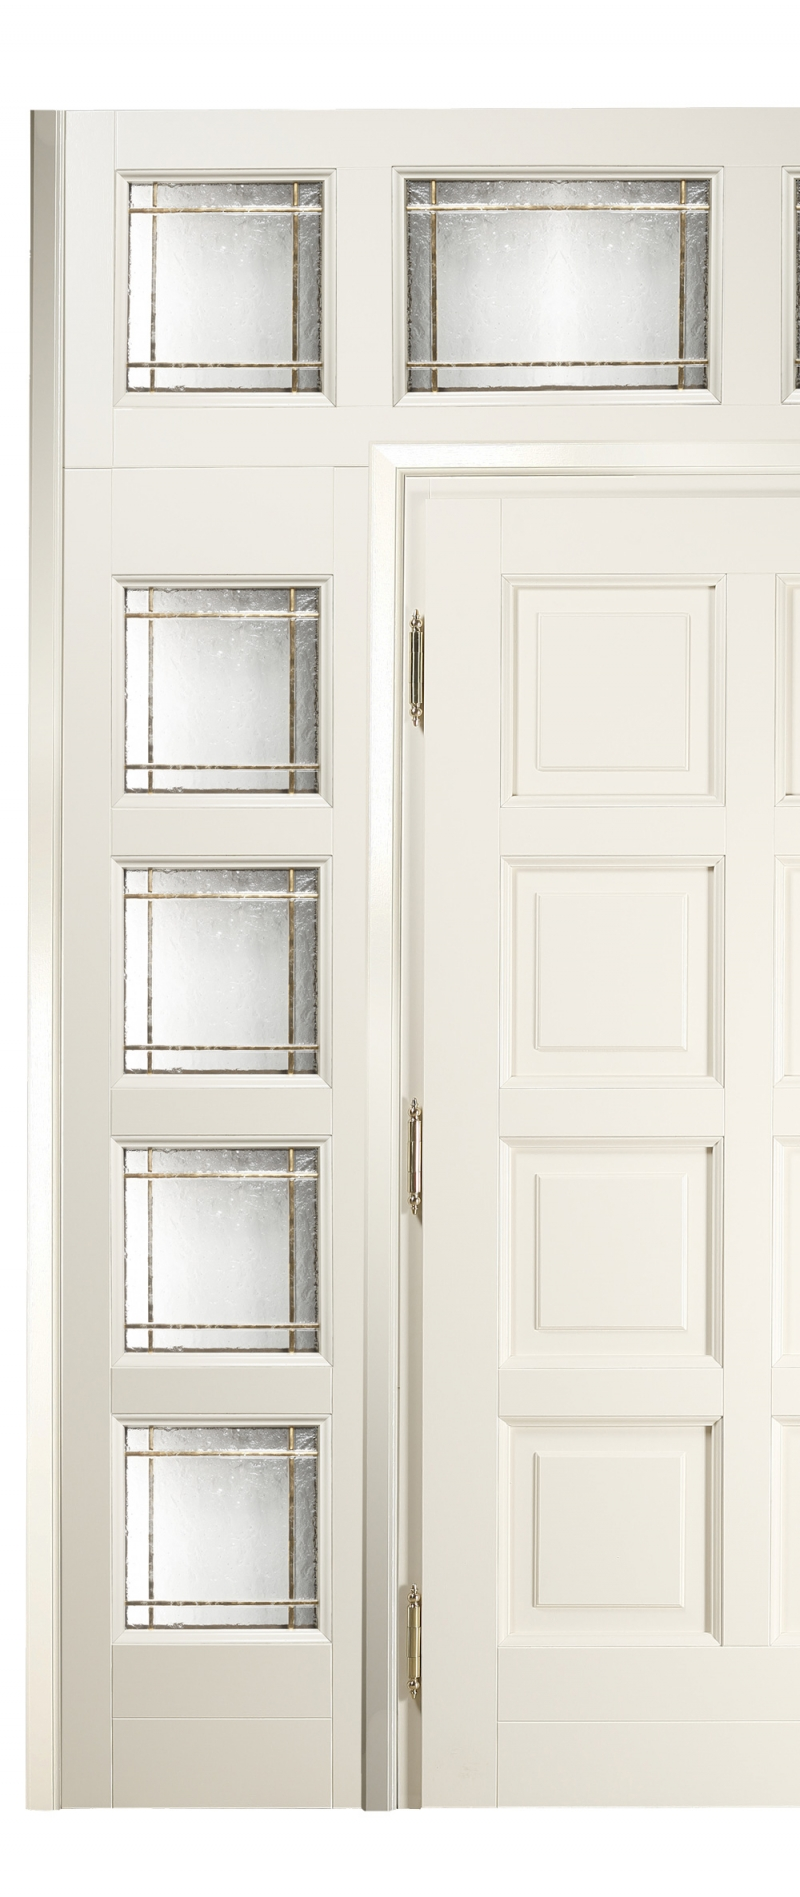 Porta interna a vetro custom sige s r l - Porta interna vetro ...